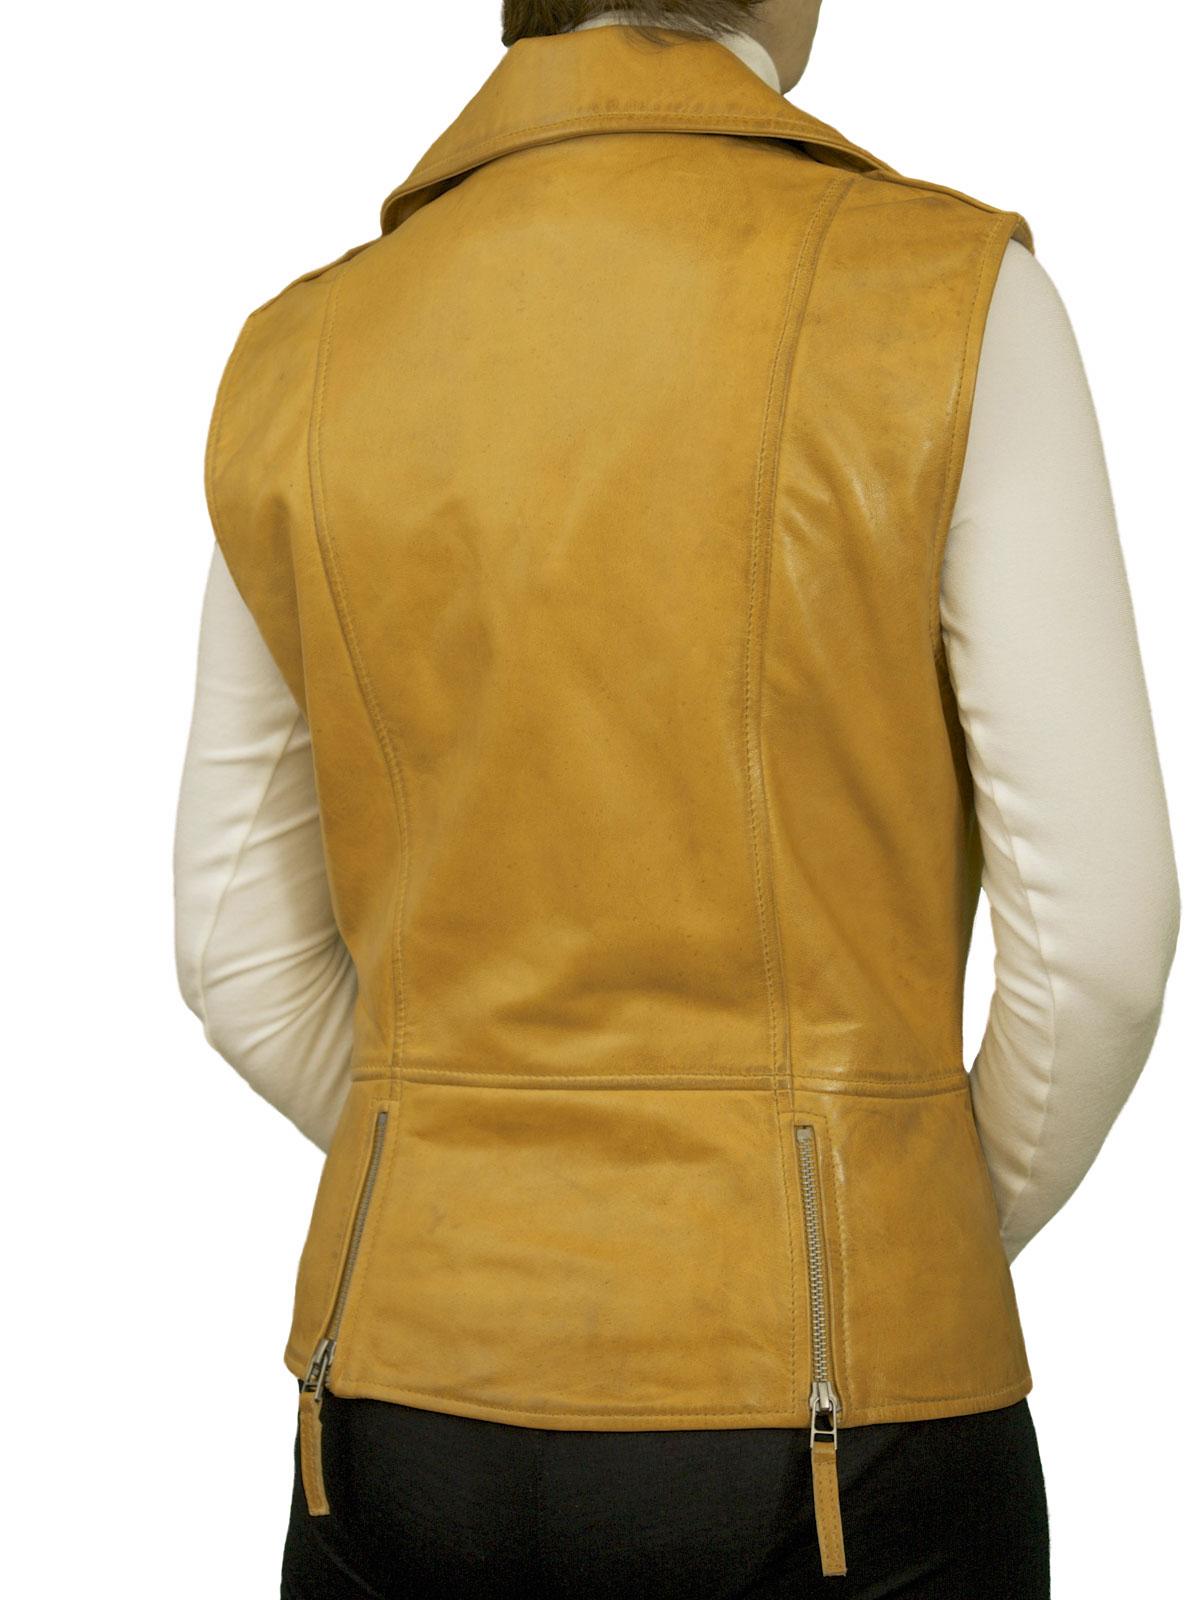 Womens Leather Gilet Waistcoat Biker Style Tout Ensemble